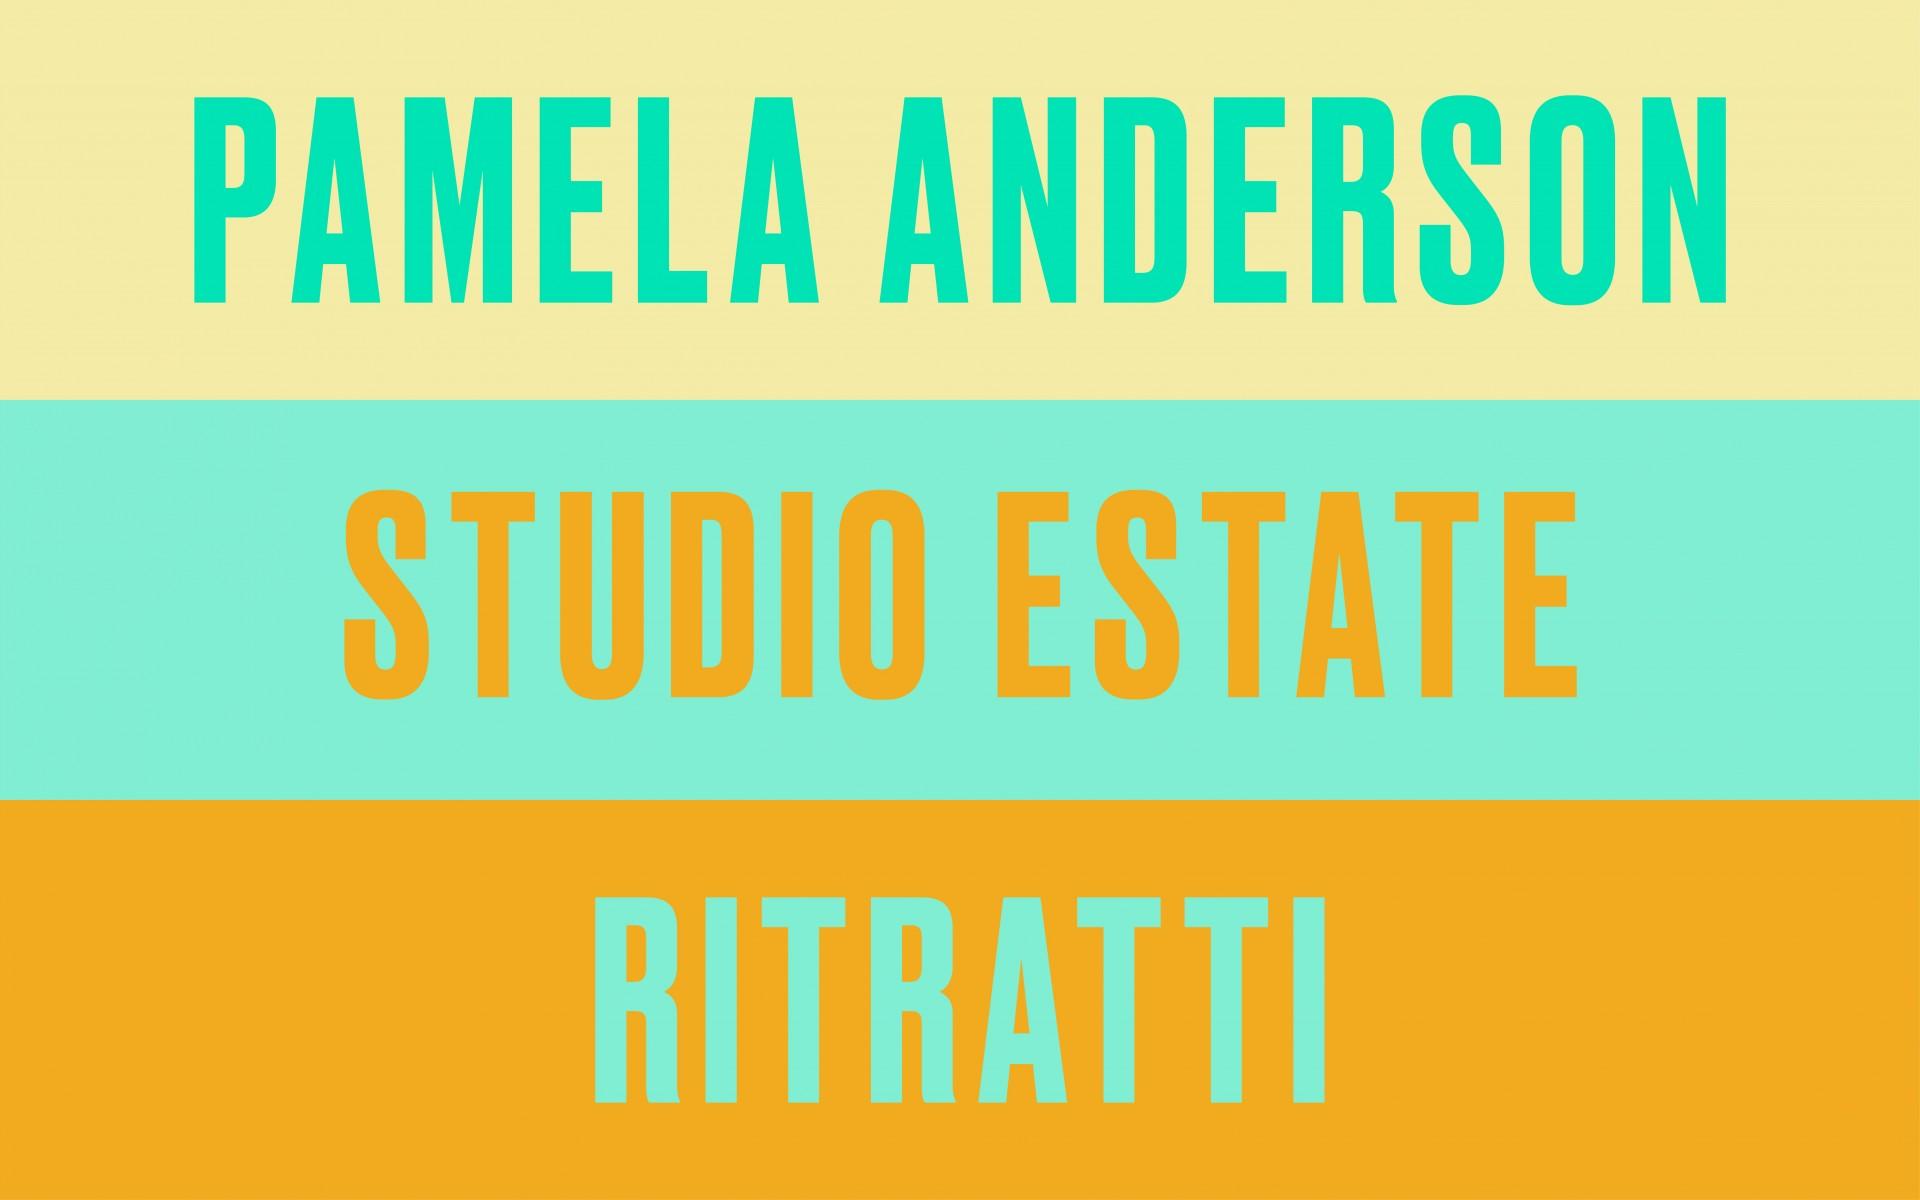 Studio estate Pamela Anderson